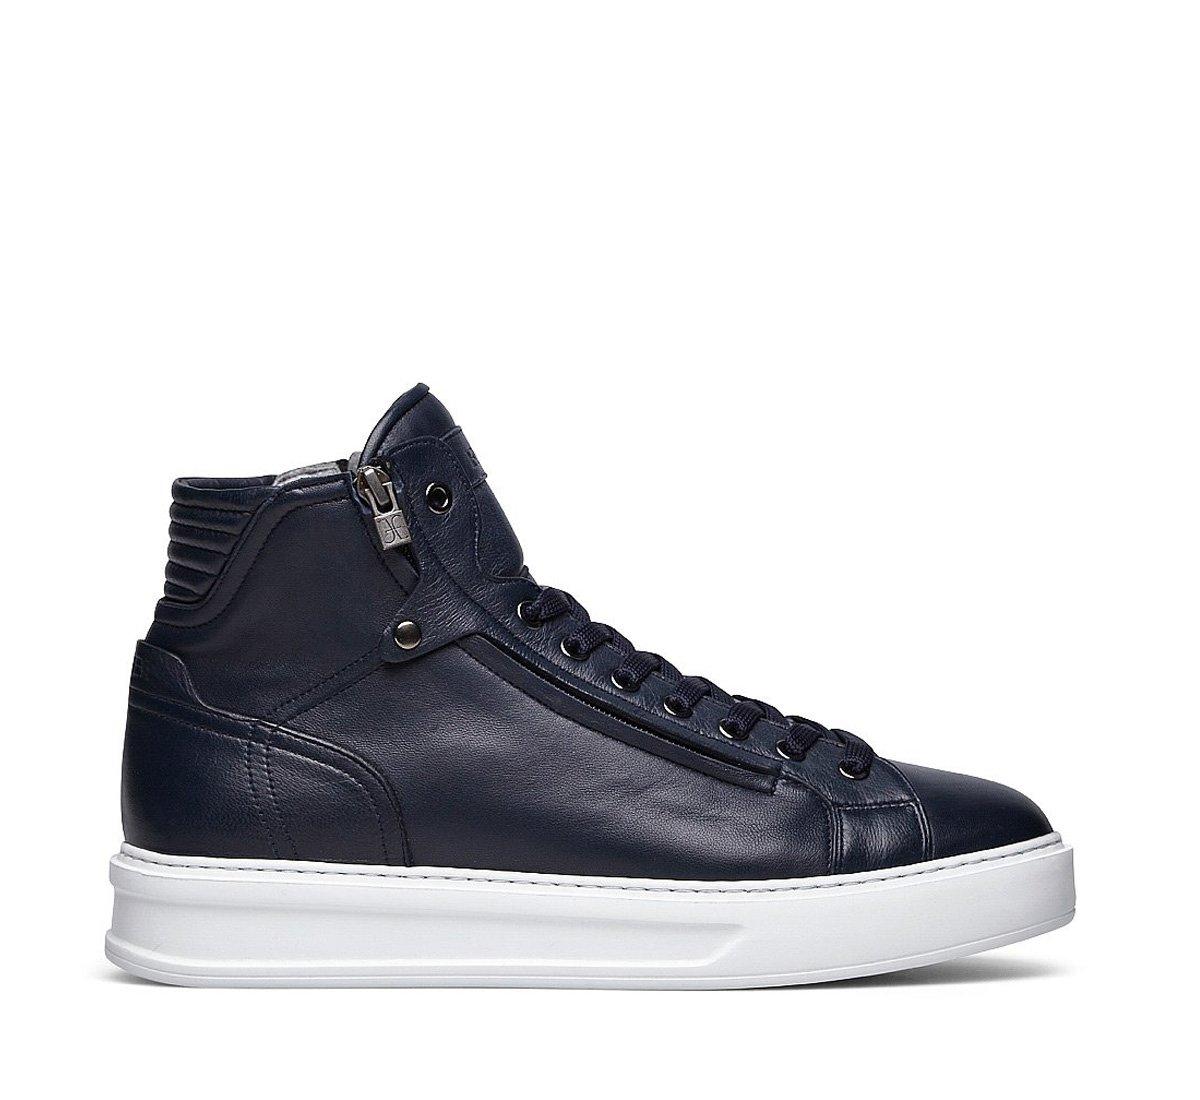 Rainier sneakers